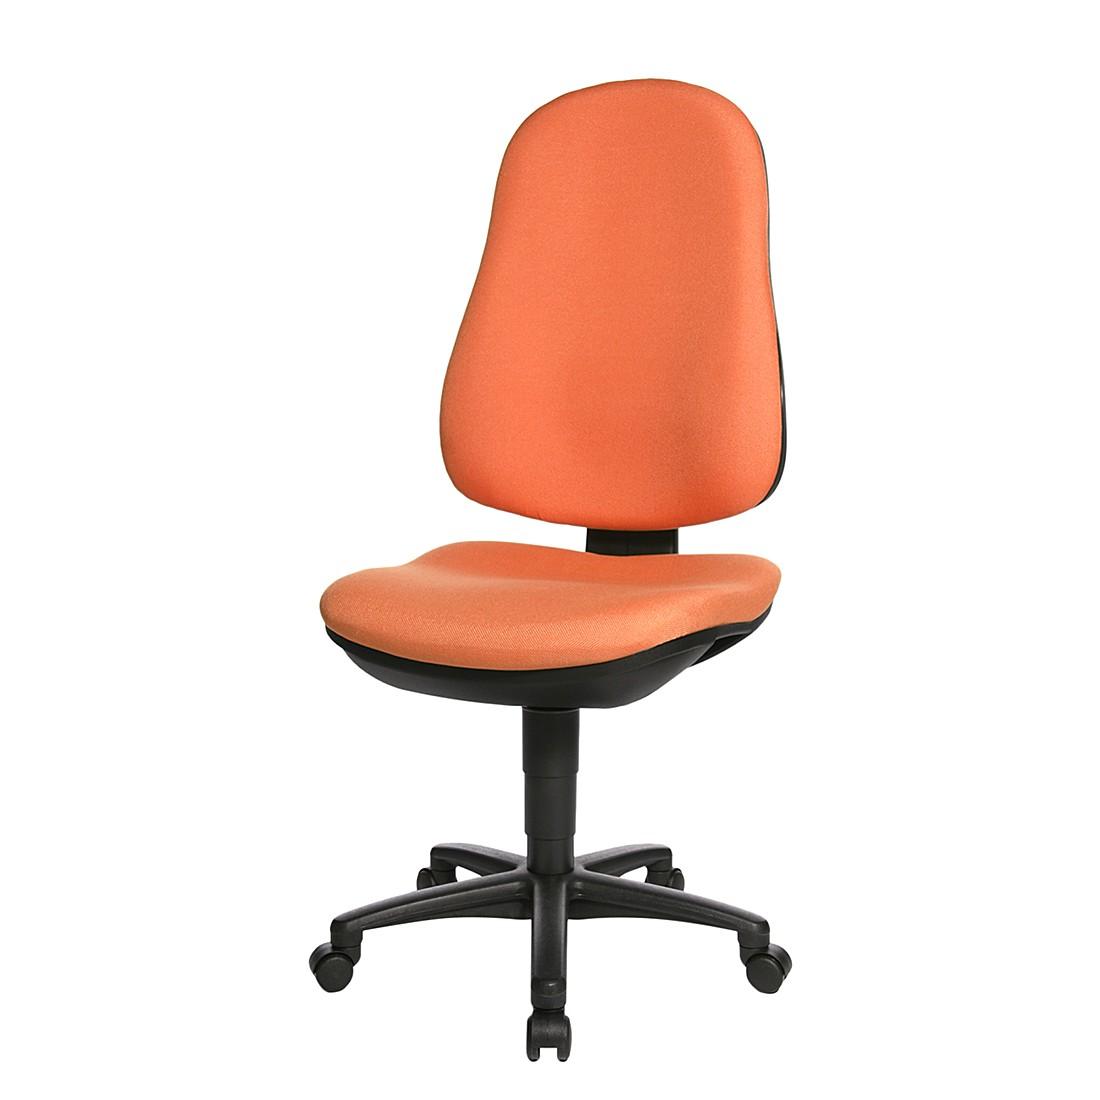 Bürostuhl Support P – Orange/Schwarz, Topstar günstig